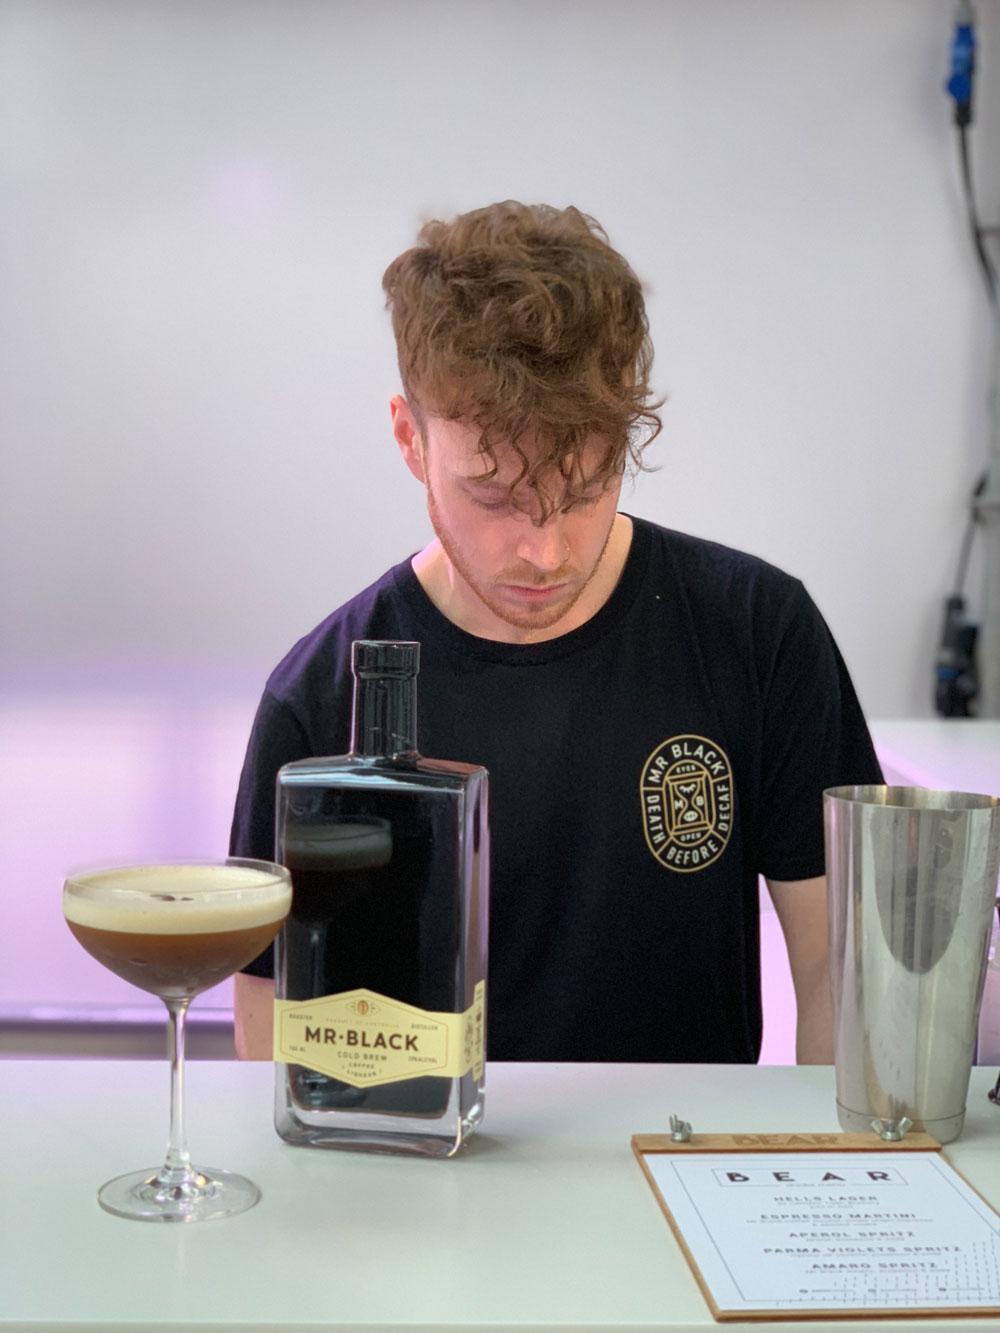 Alex making cocktails